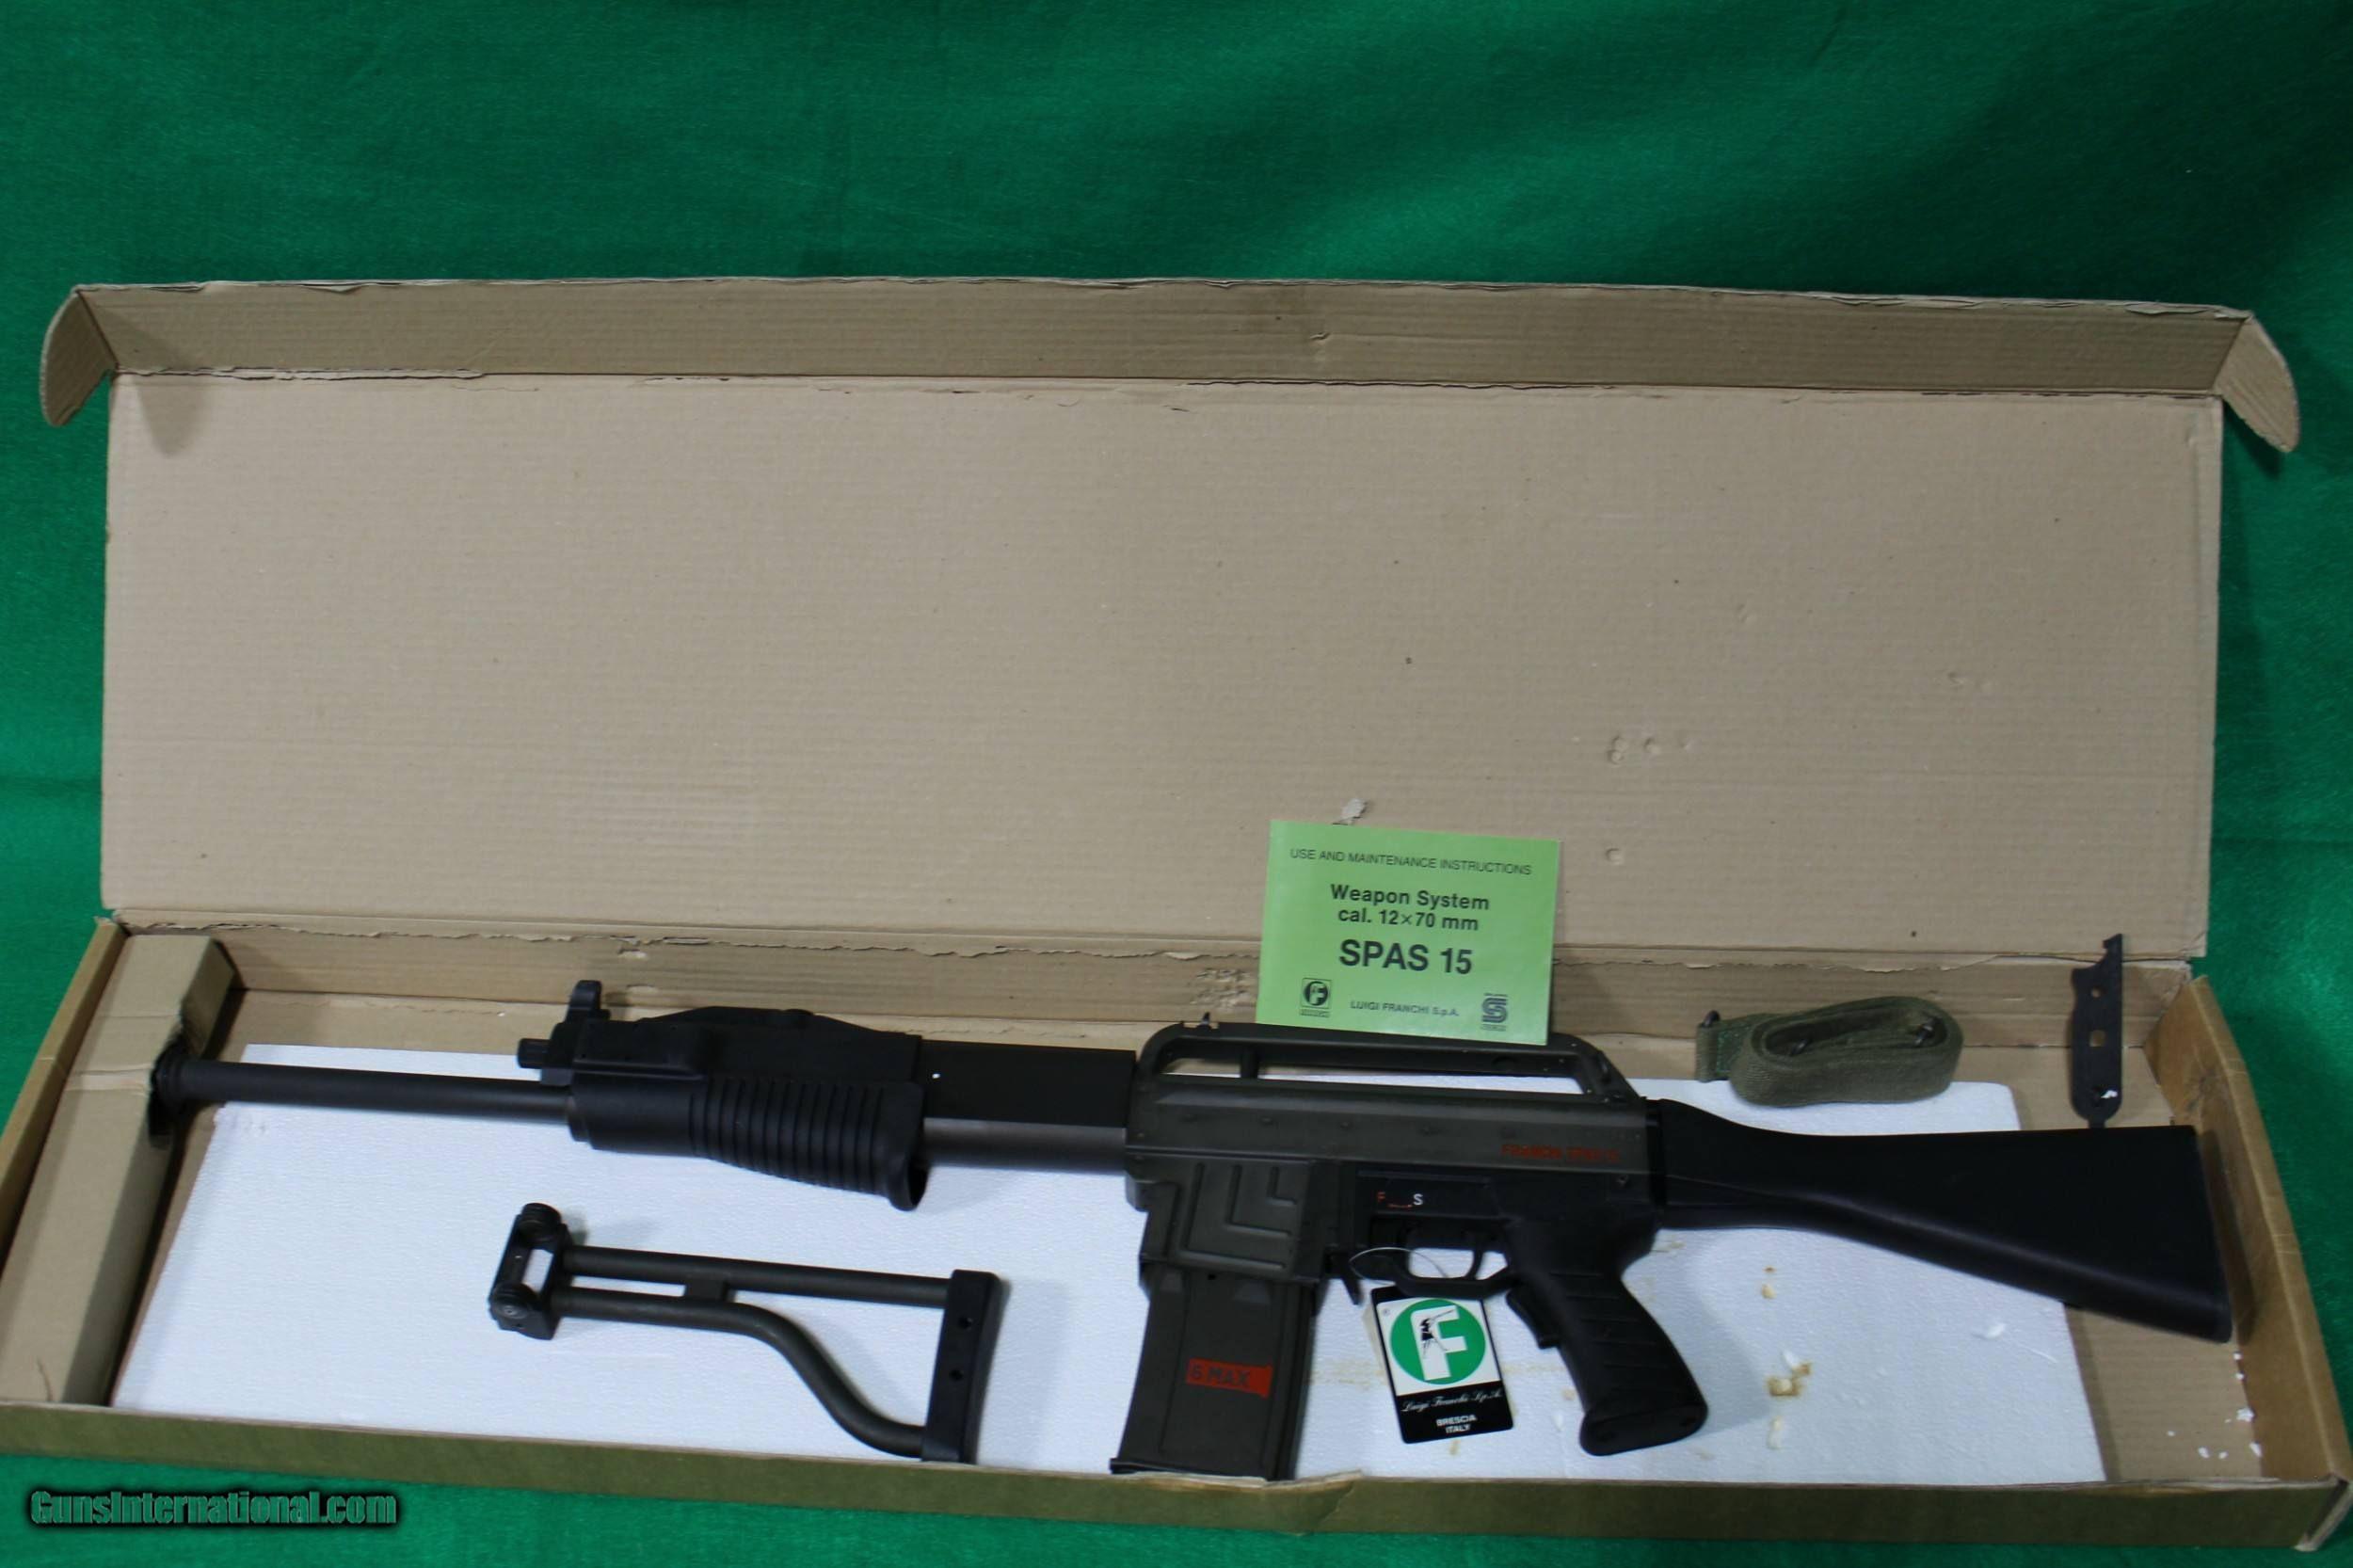 1/6 Scale Toy Colt Weapon Series II M4 Rifle W/ Shotgun Attachment ...